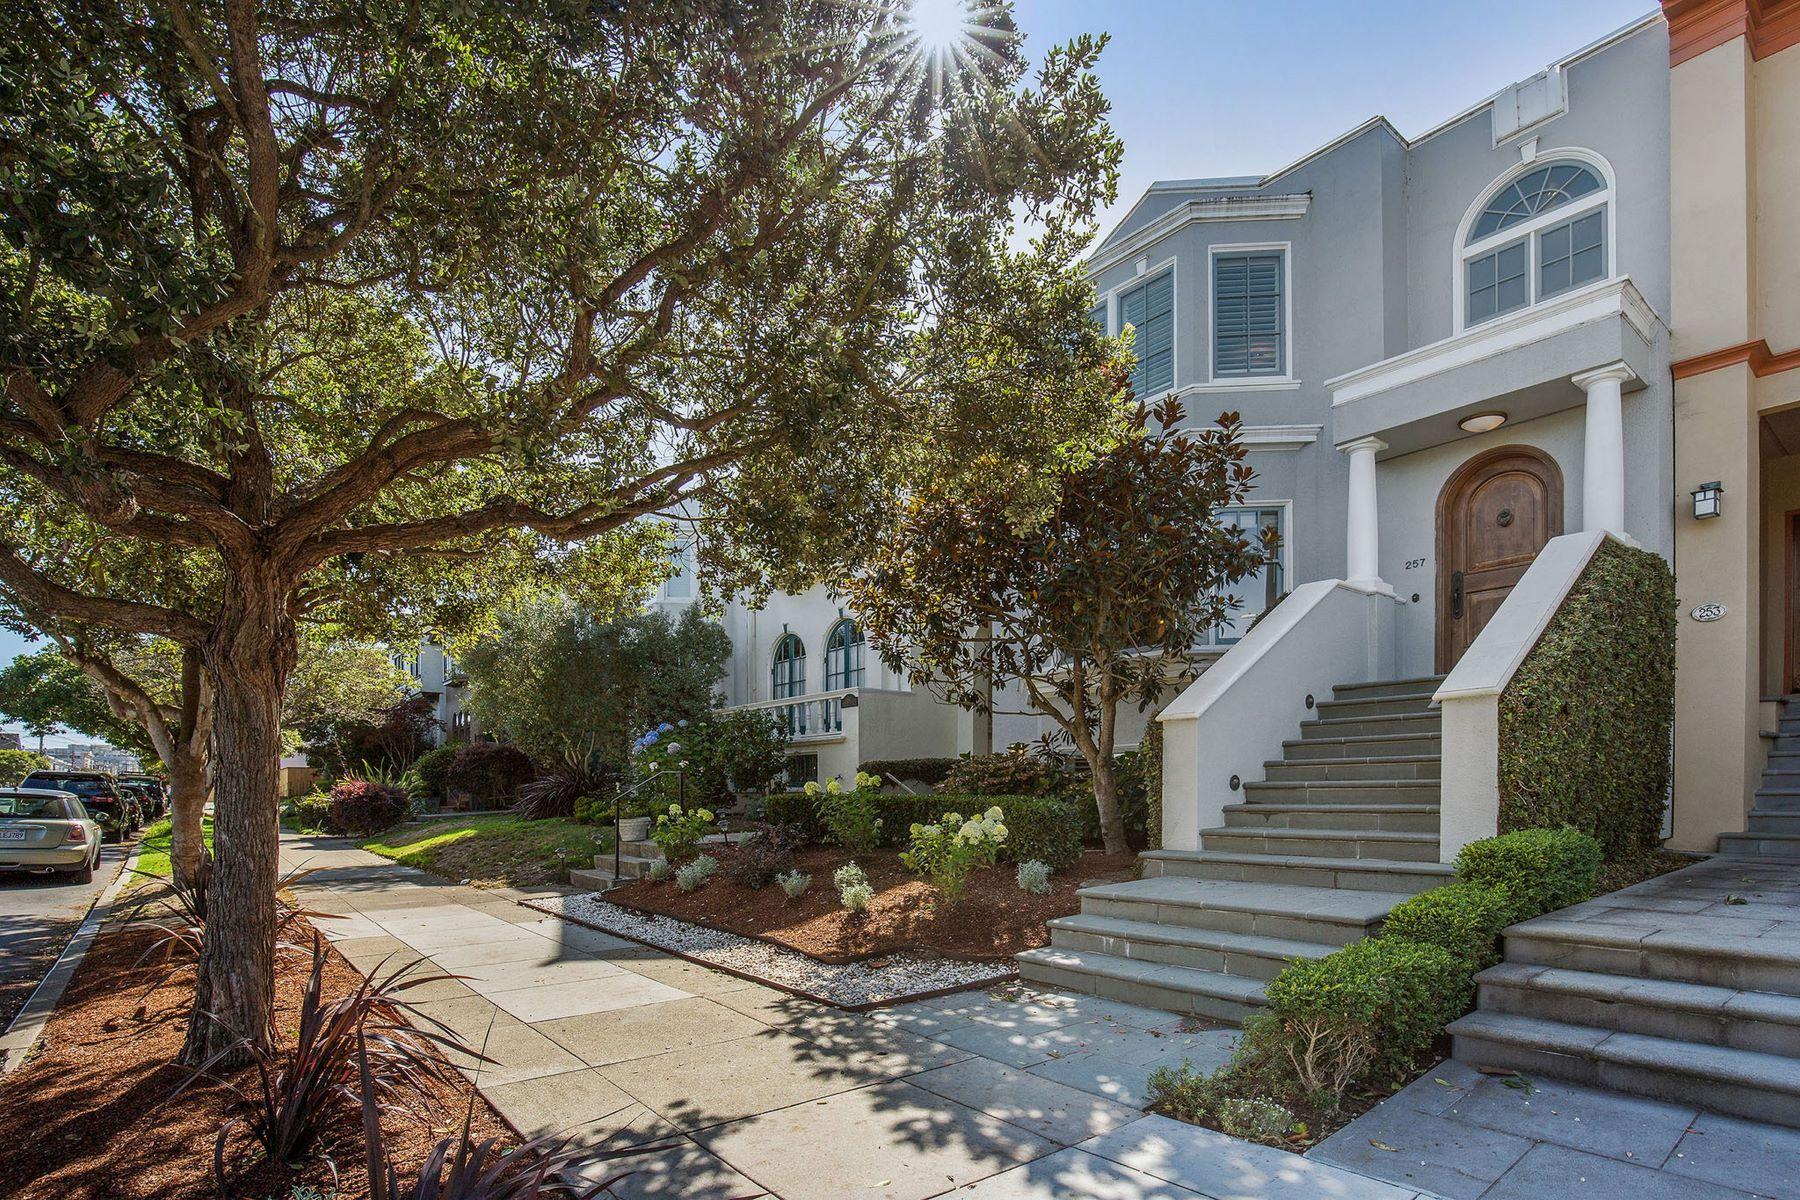 Single Family Homes 为 销售 在 Beautifully Remodeled Sea Cliff Home on Quiet Tree-Lined Street 257 29th Avenue 旧金山, 加利福尼亚州 94121 美国